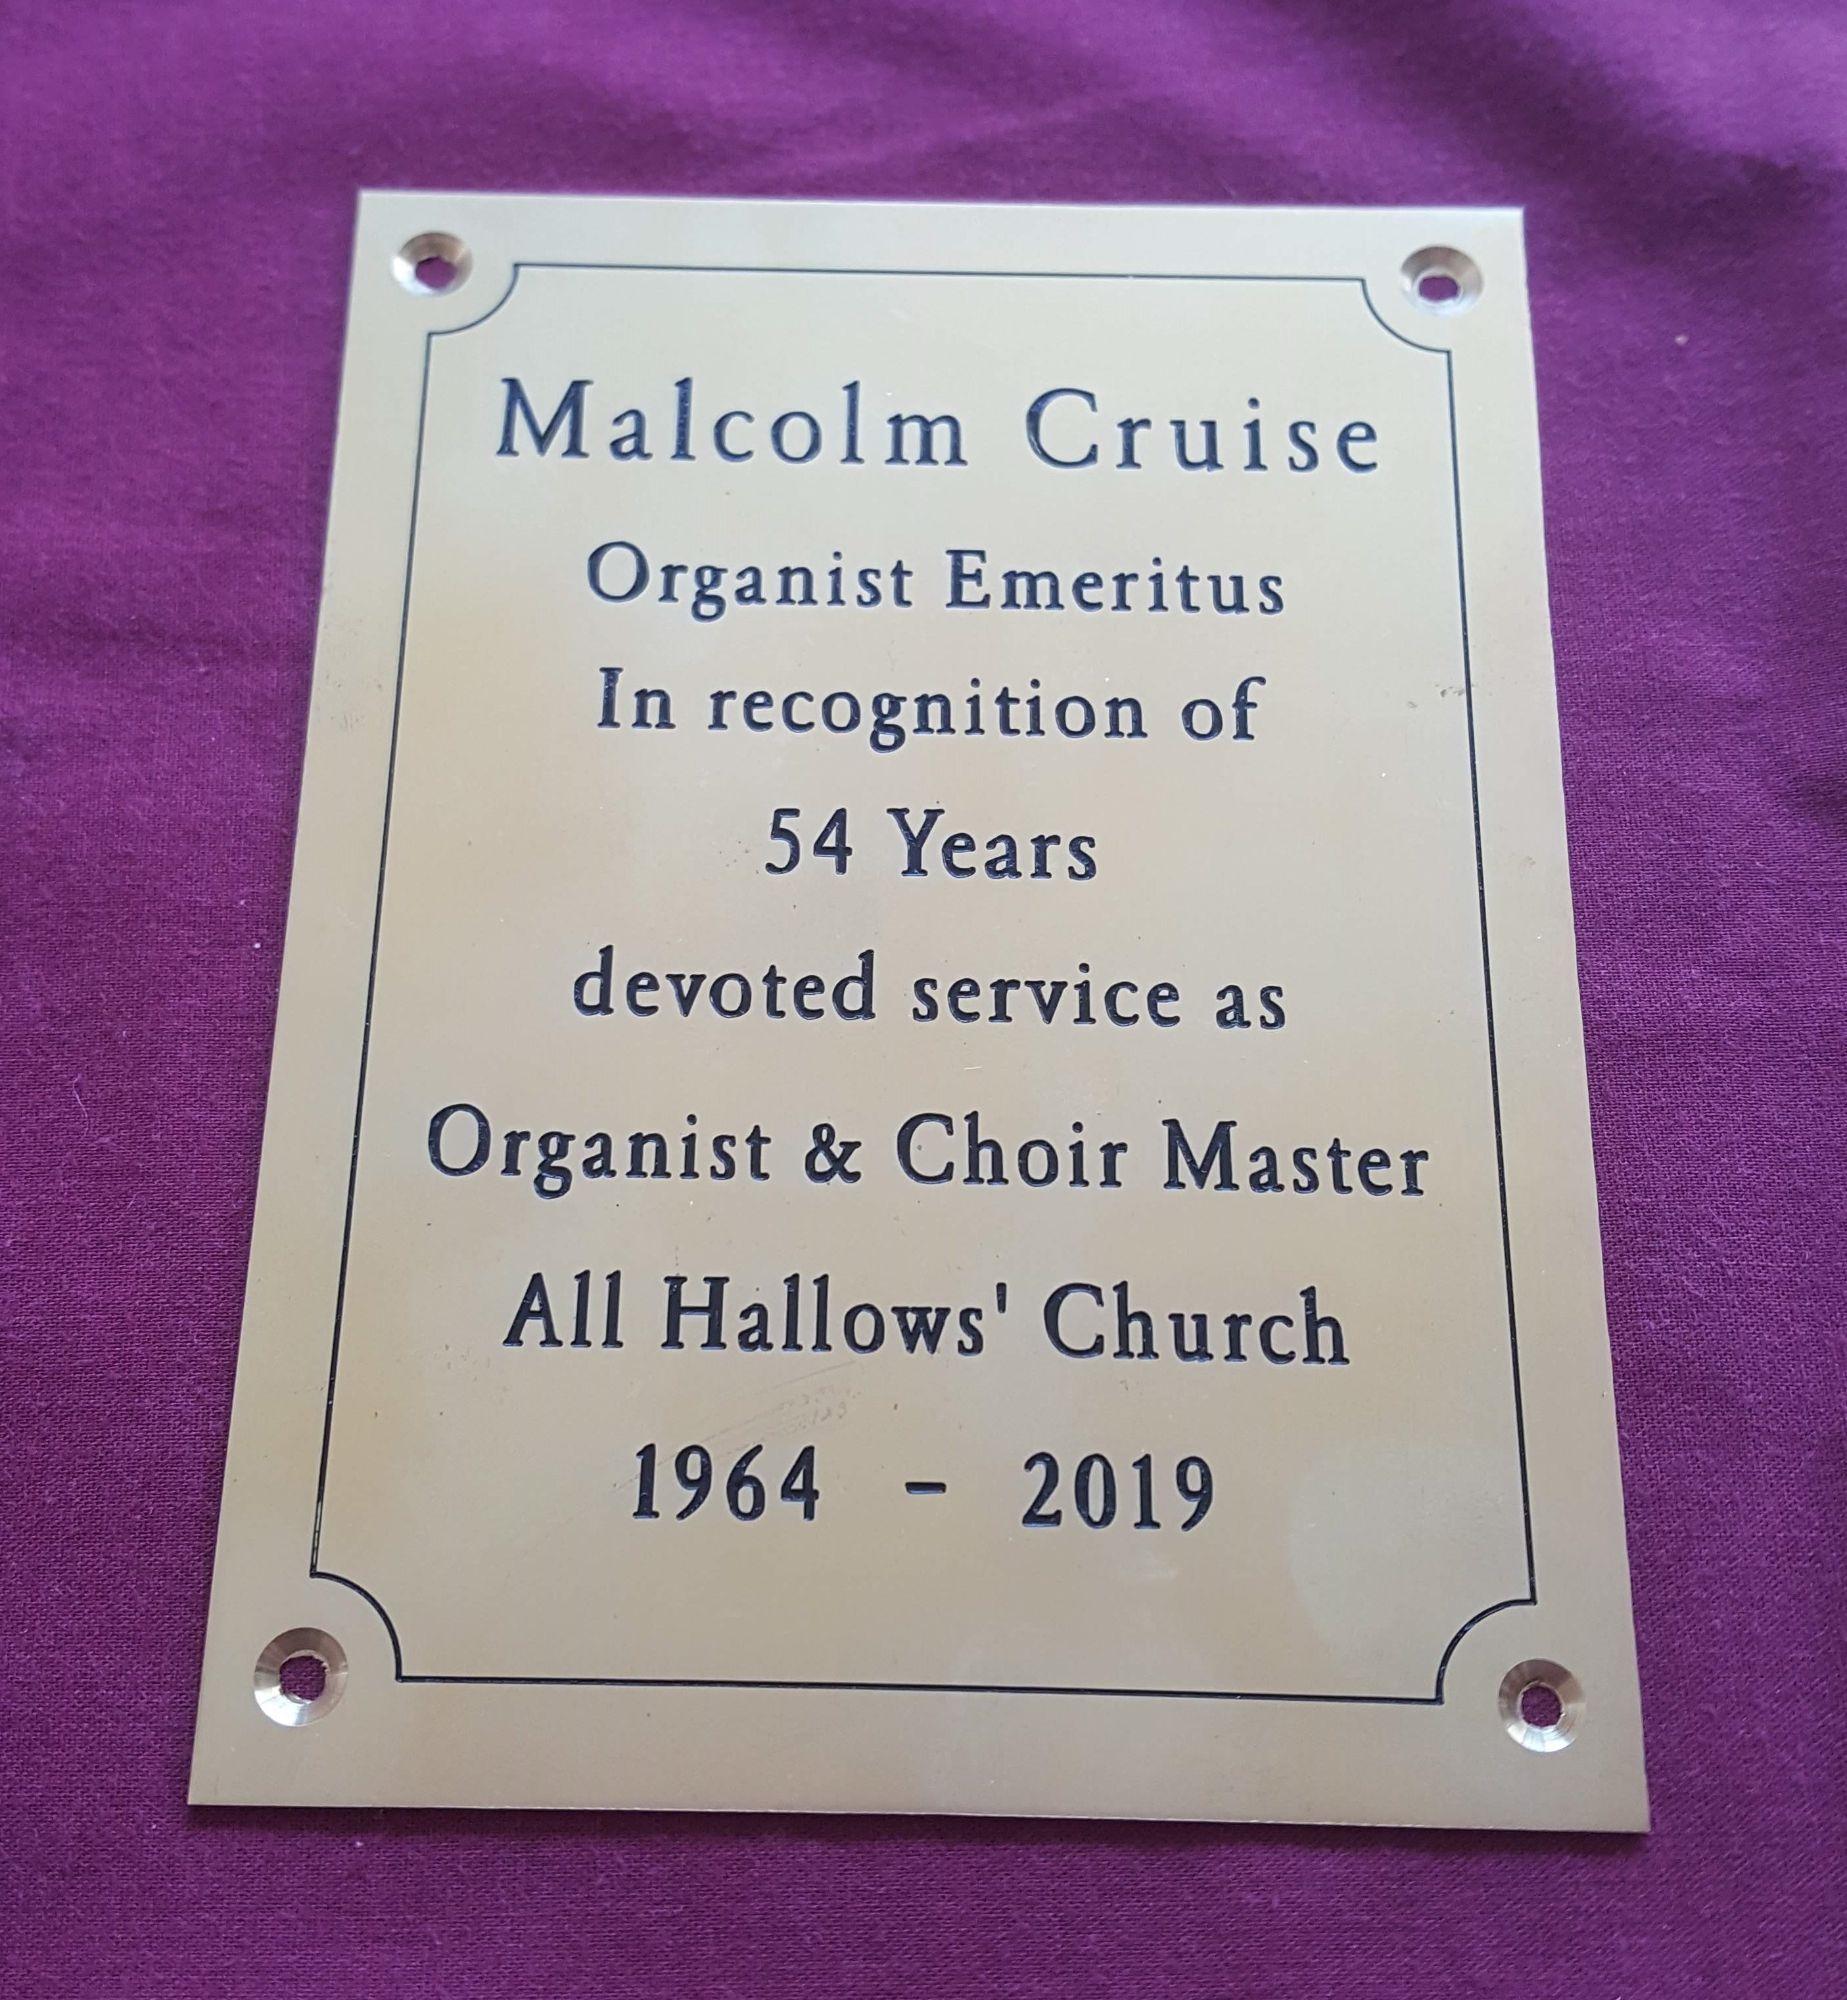 Malcolm Cruise Plaque